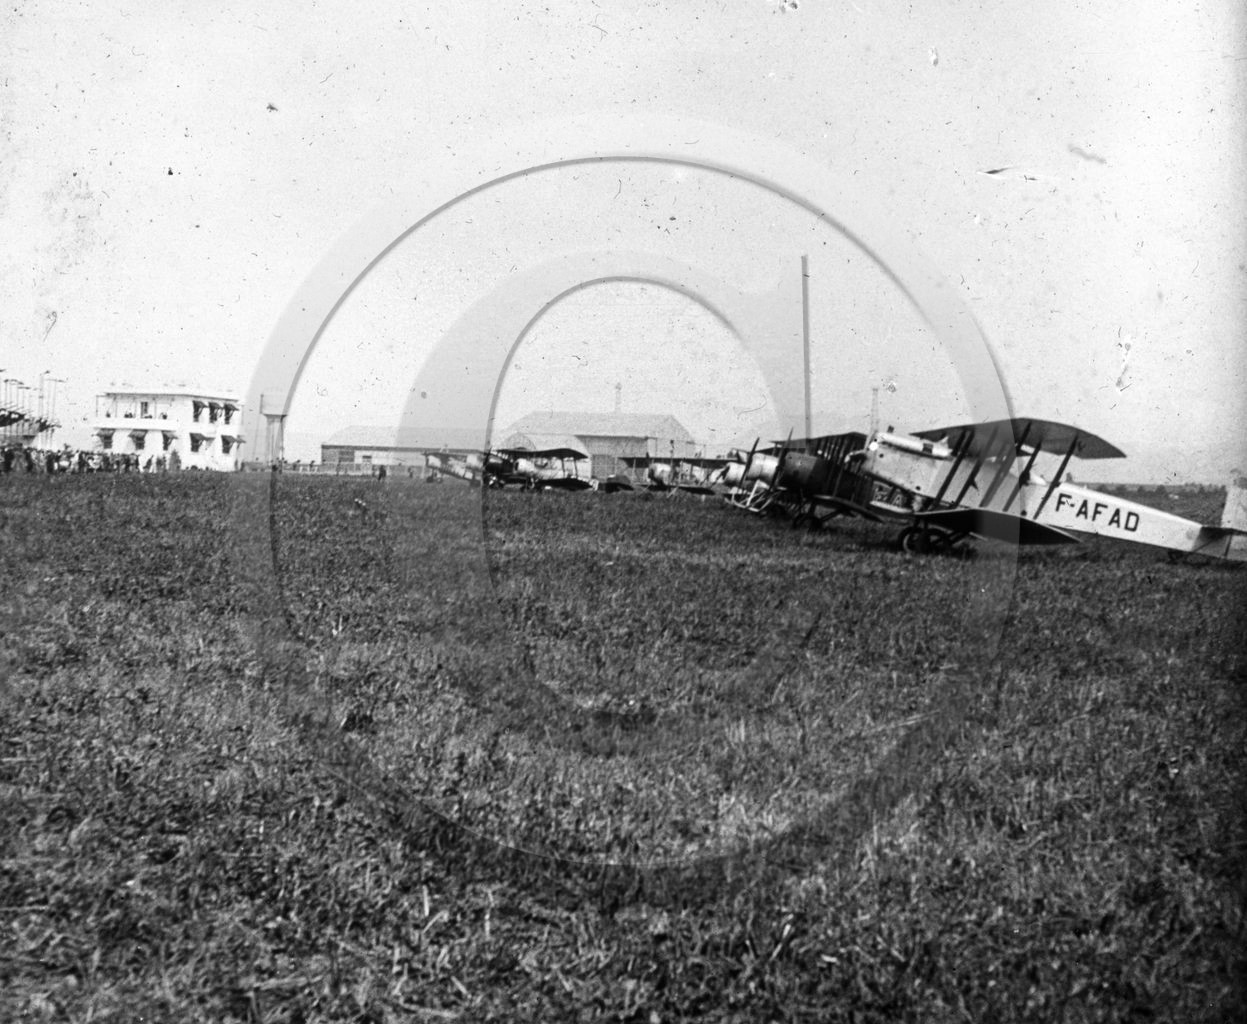 Avi 206 doran ar1 ou2 maison blanche alger fete aerienne 27 mai 1928 jpg